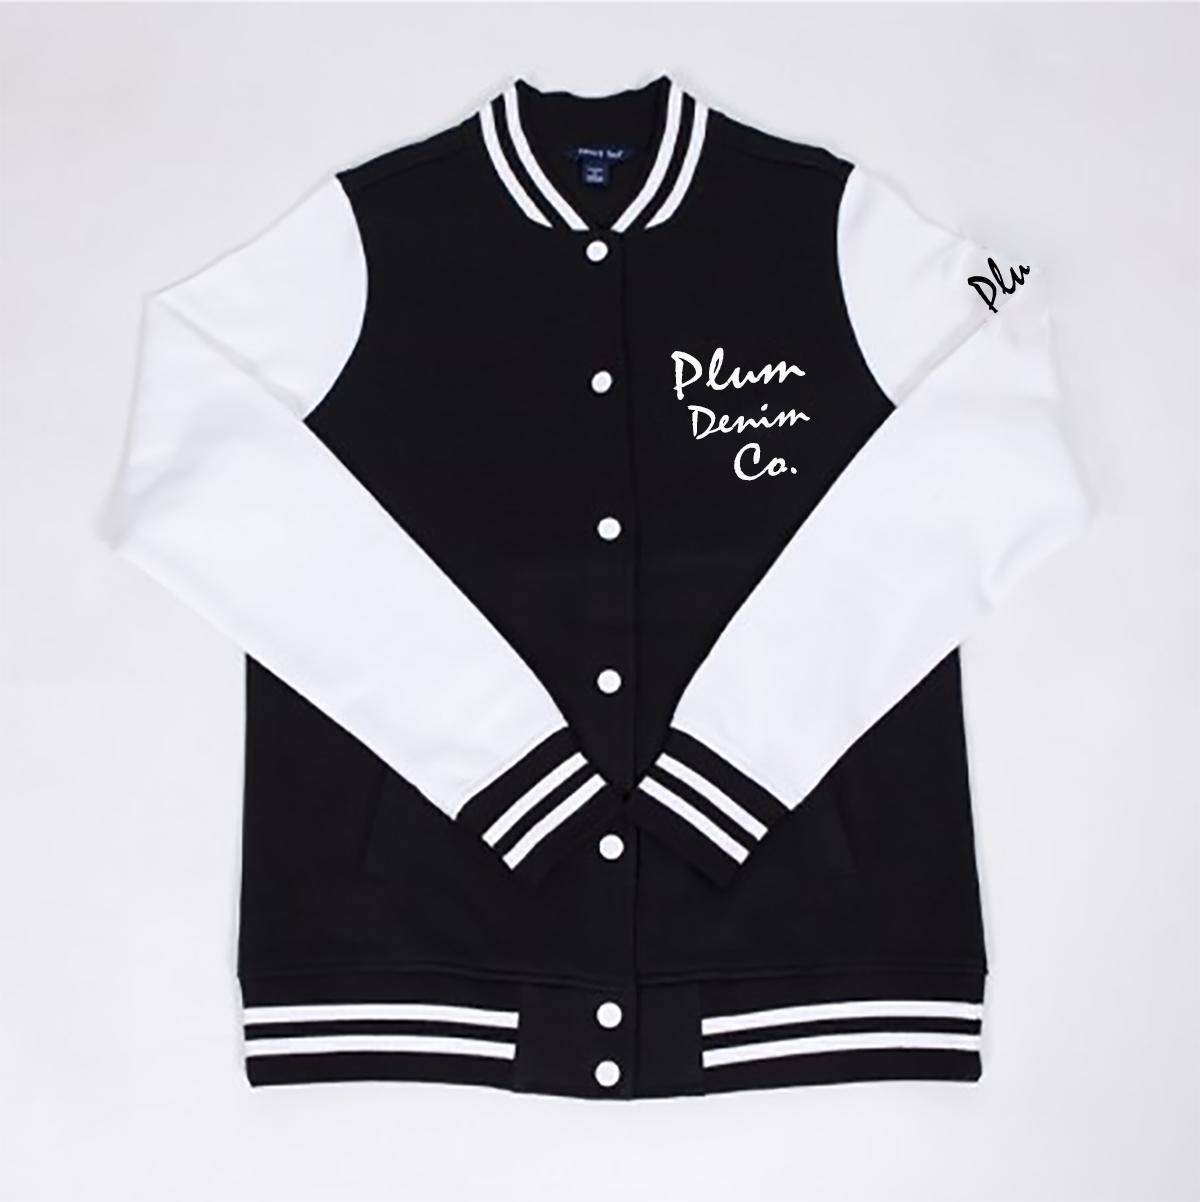 Plum Denim Co. Lady Varsity Jacket